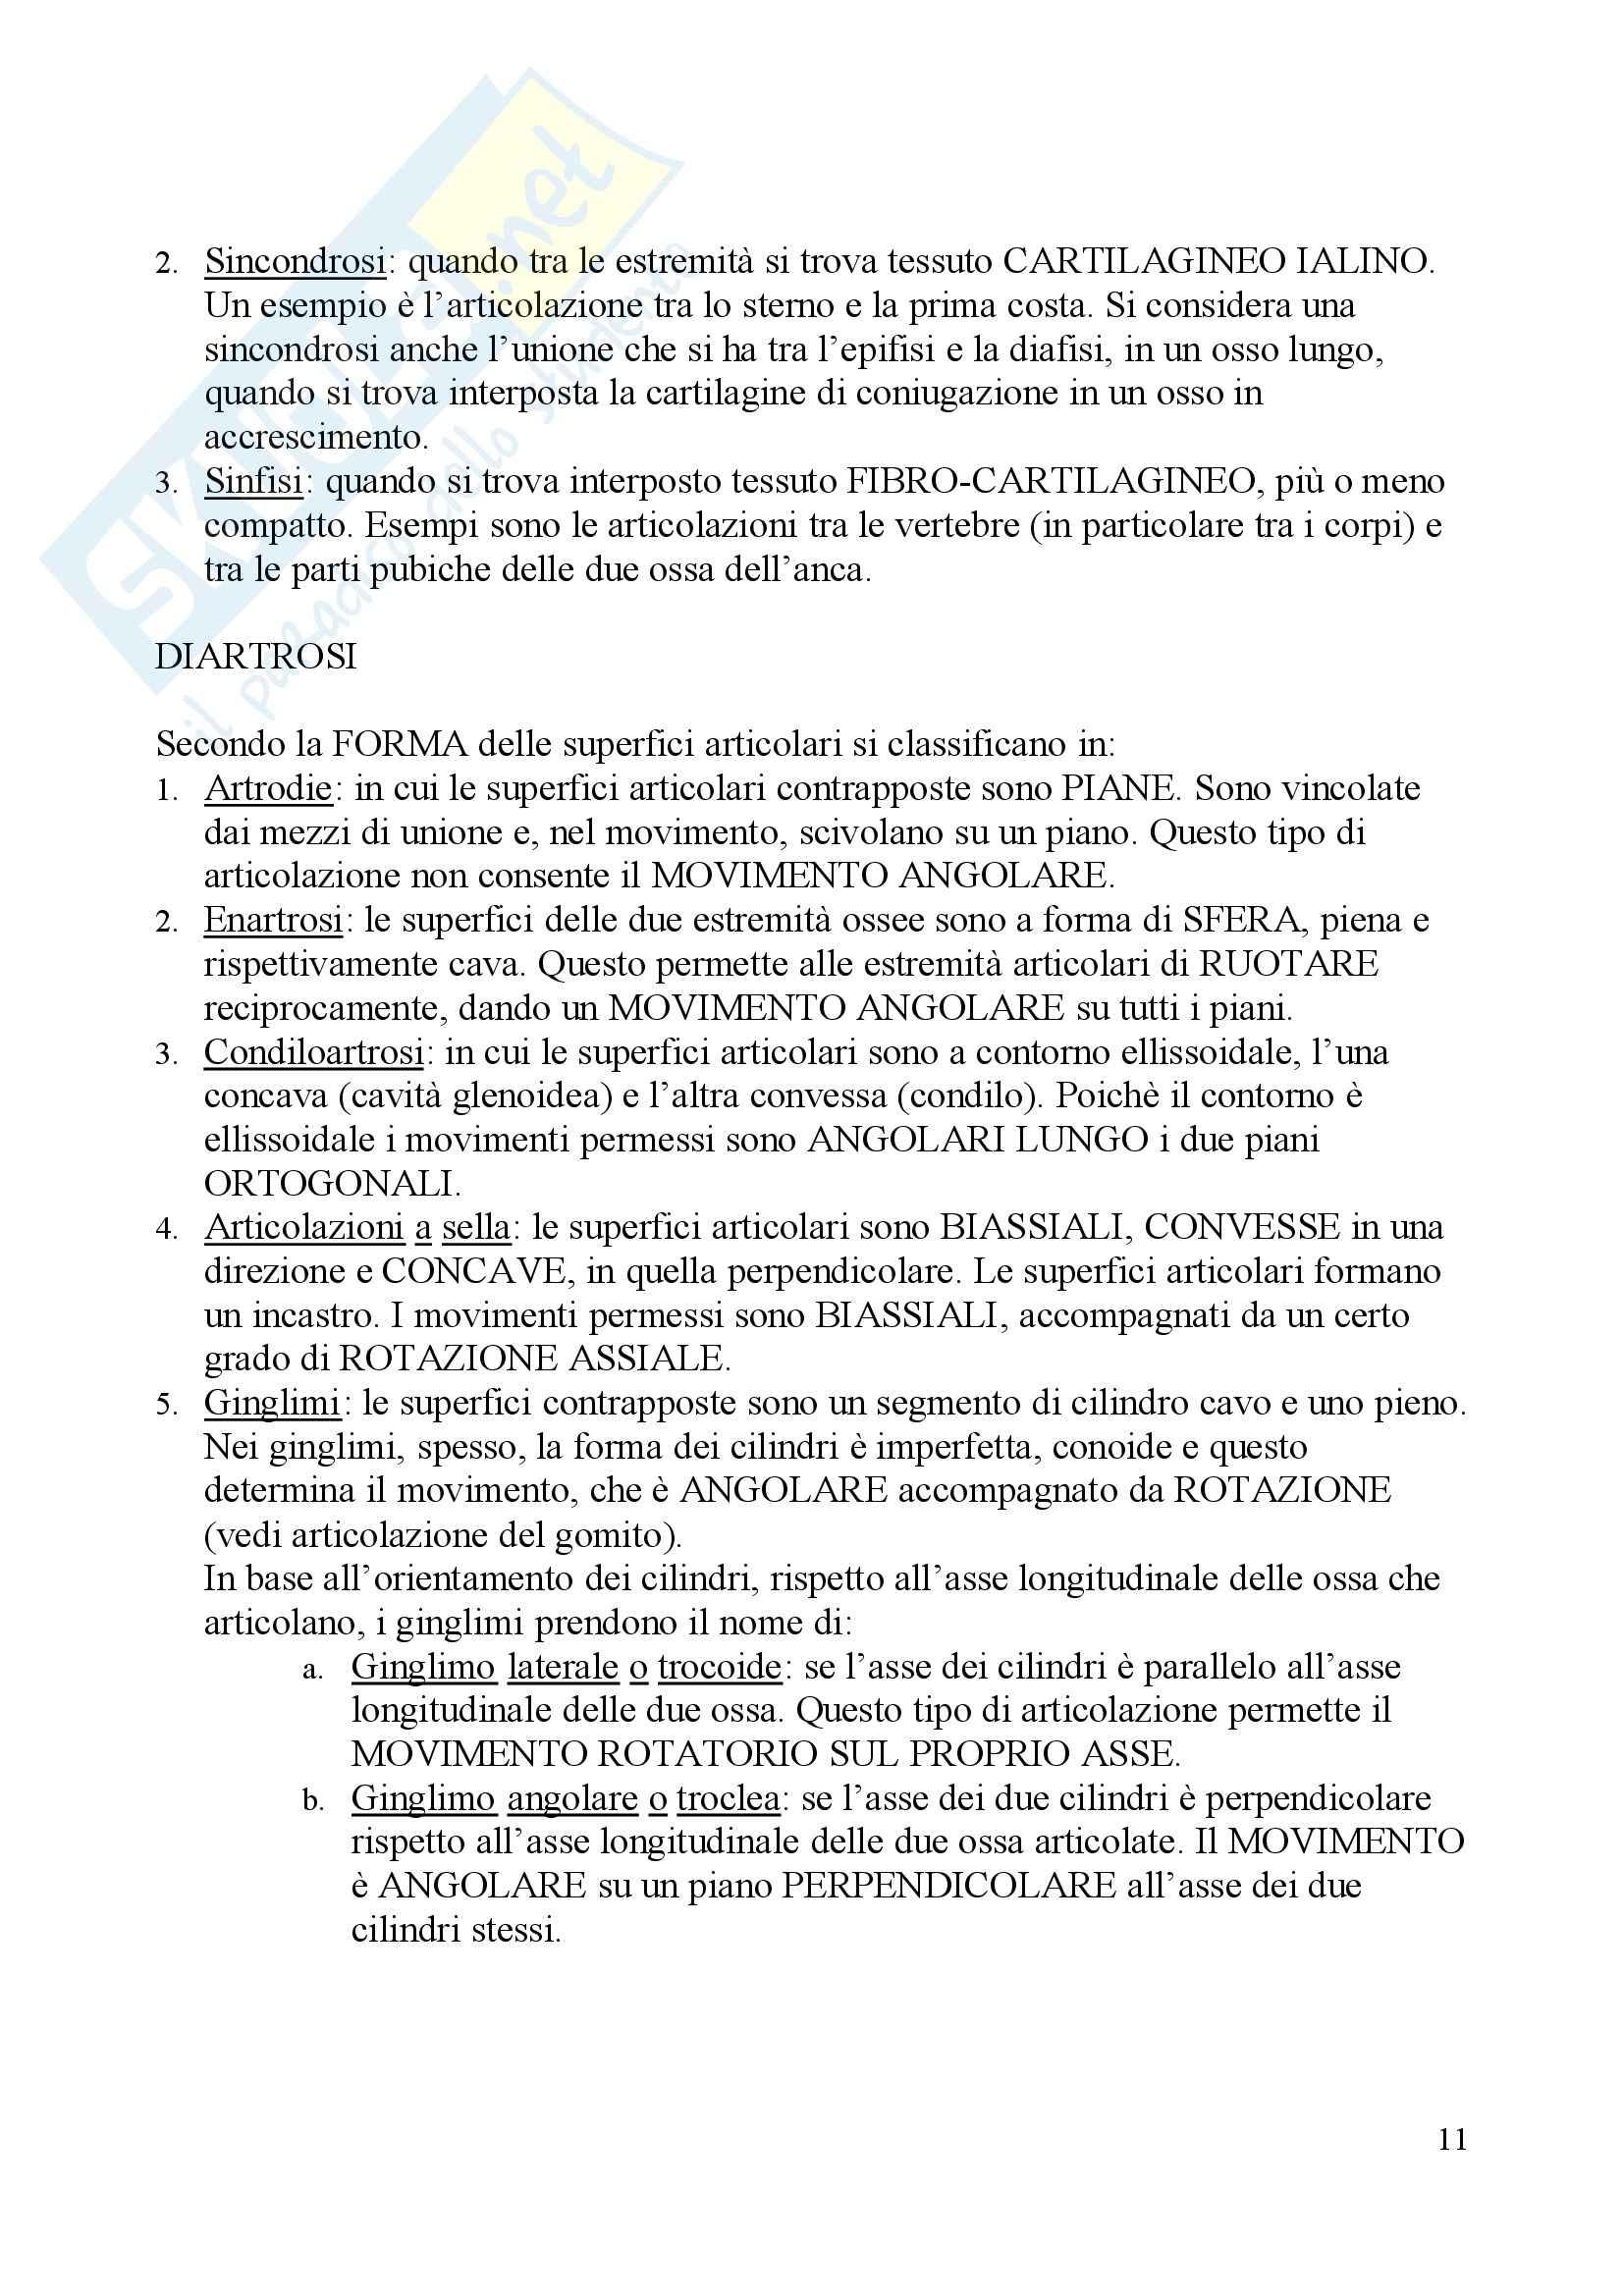 Anatomia I – Apparato locomotore Pag. 11